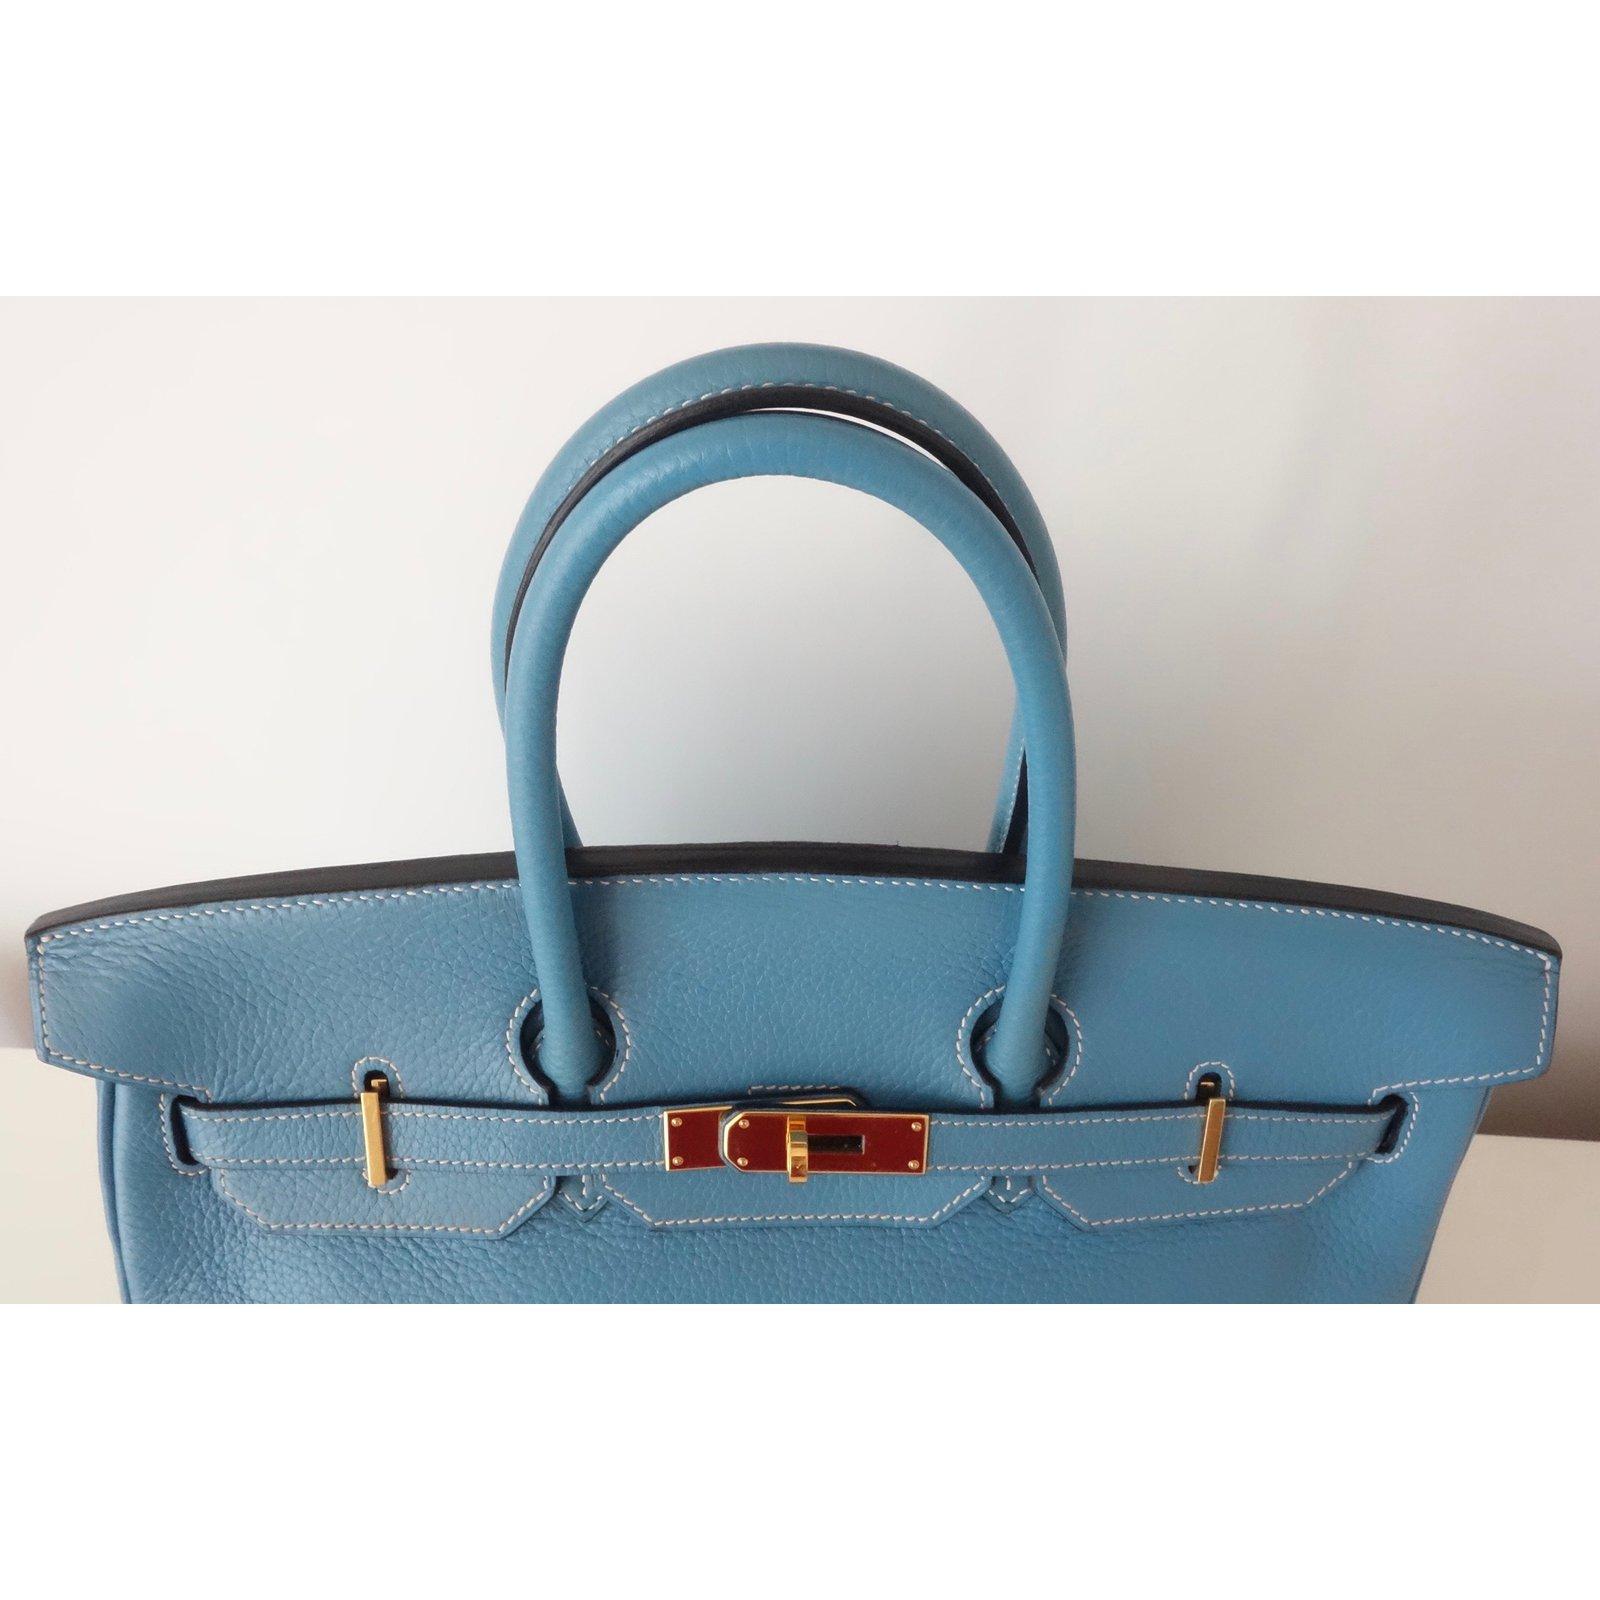 c656c299c862 ... order hermès birkin 35 handbags leather blue ref.77623 joli closet  023c3 b92ad